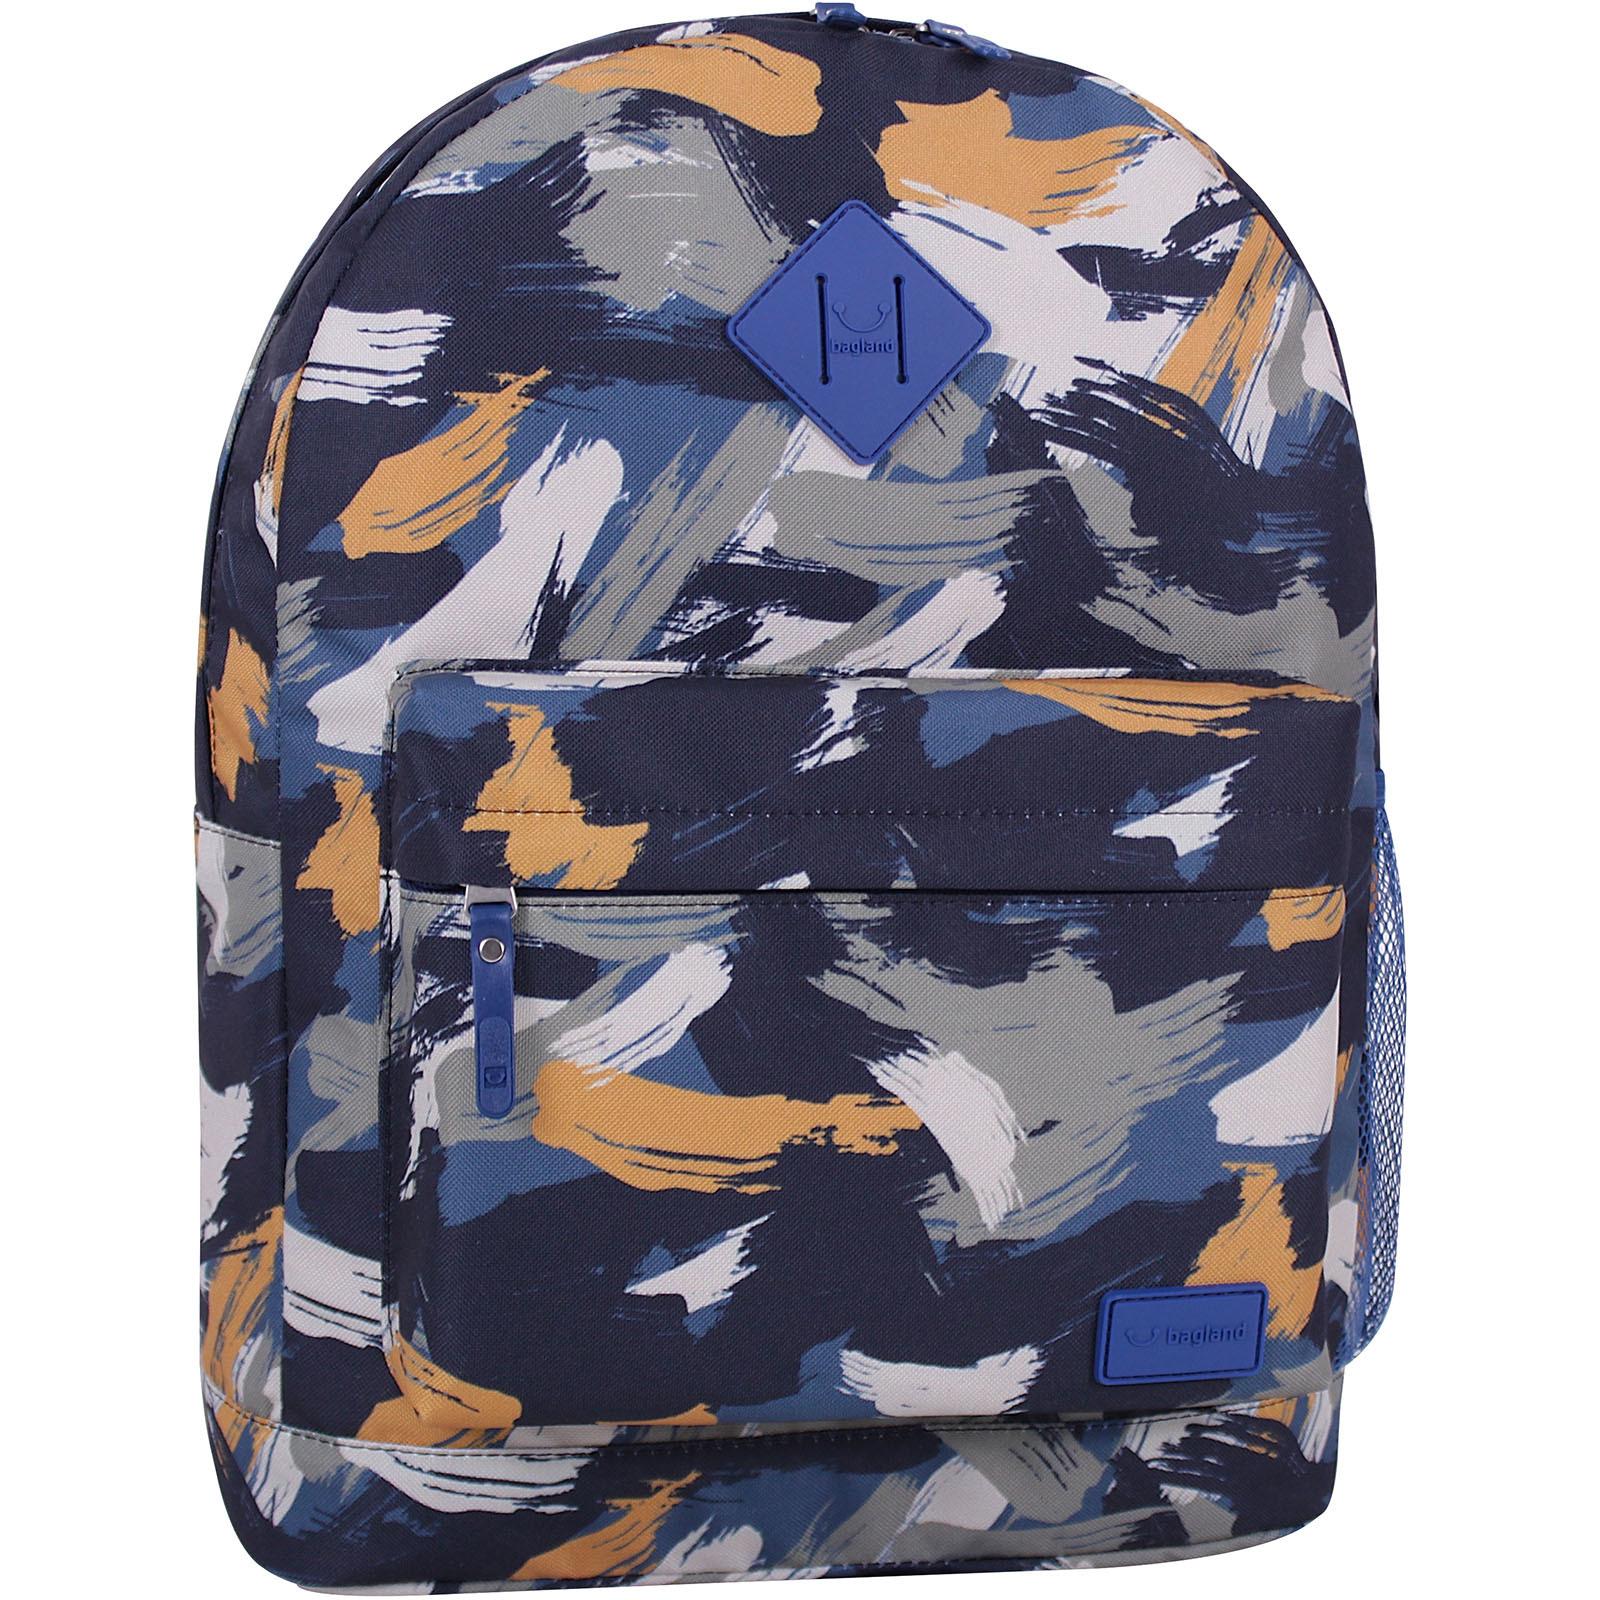 Городские рюкзаки Рюкзак Bagland Молодежный 17 л. сублимация 773 (00533664) IMG_7017_суб.773_.JPG